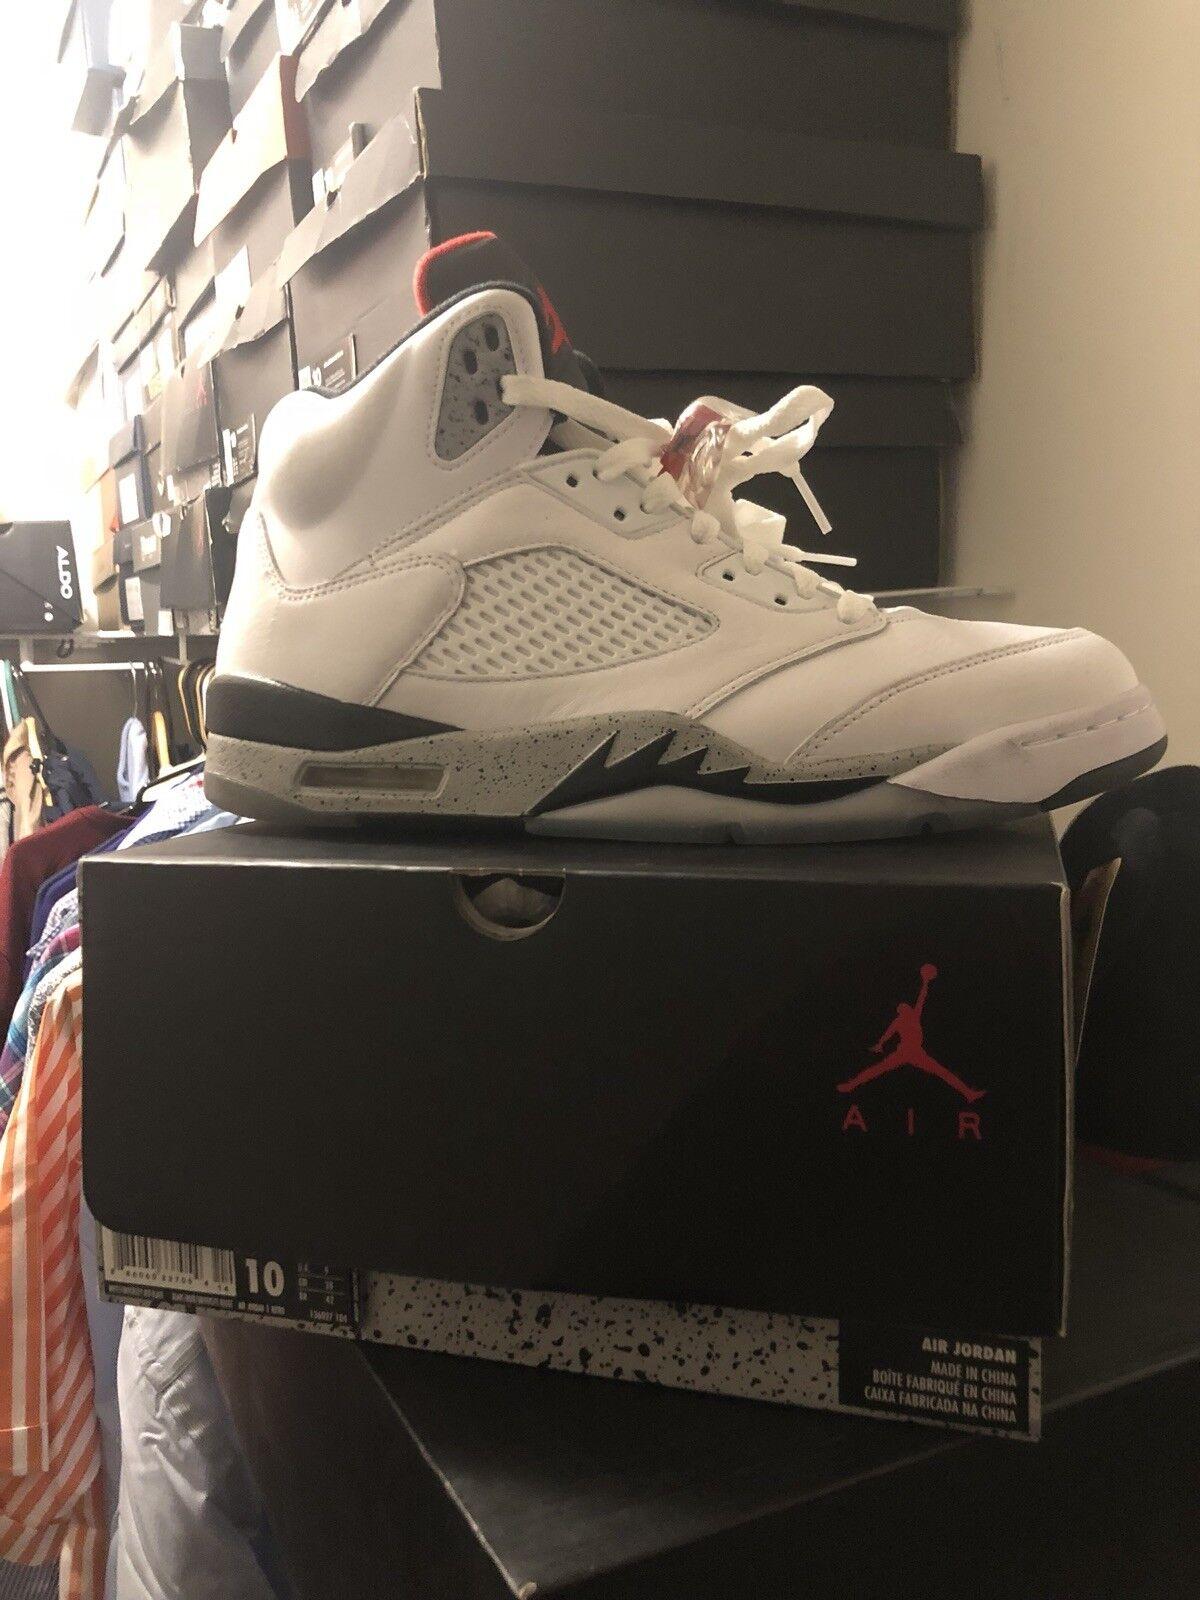 Nike Air Jordan 5 Retro Cement Size 10 White University Red Nero